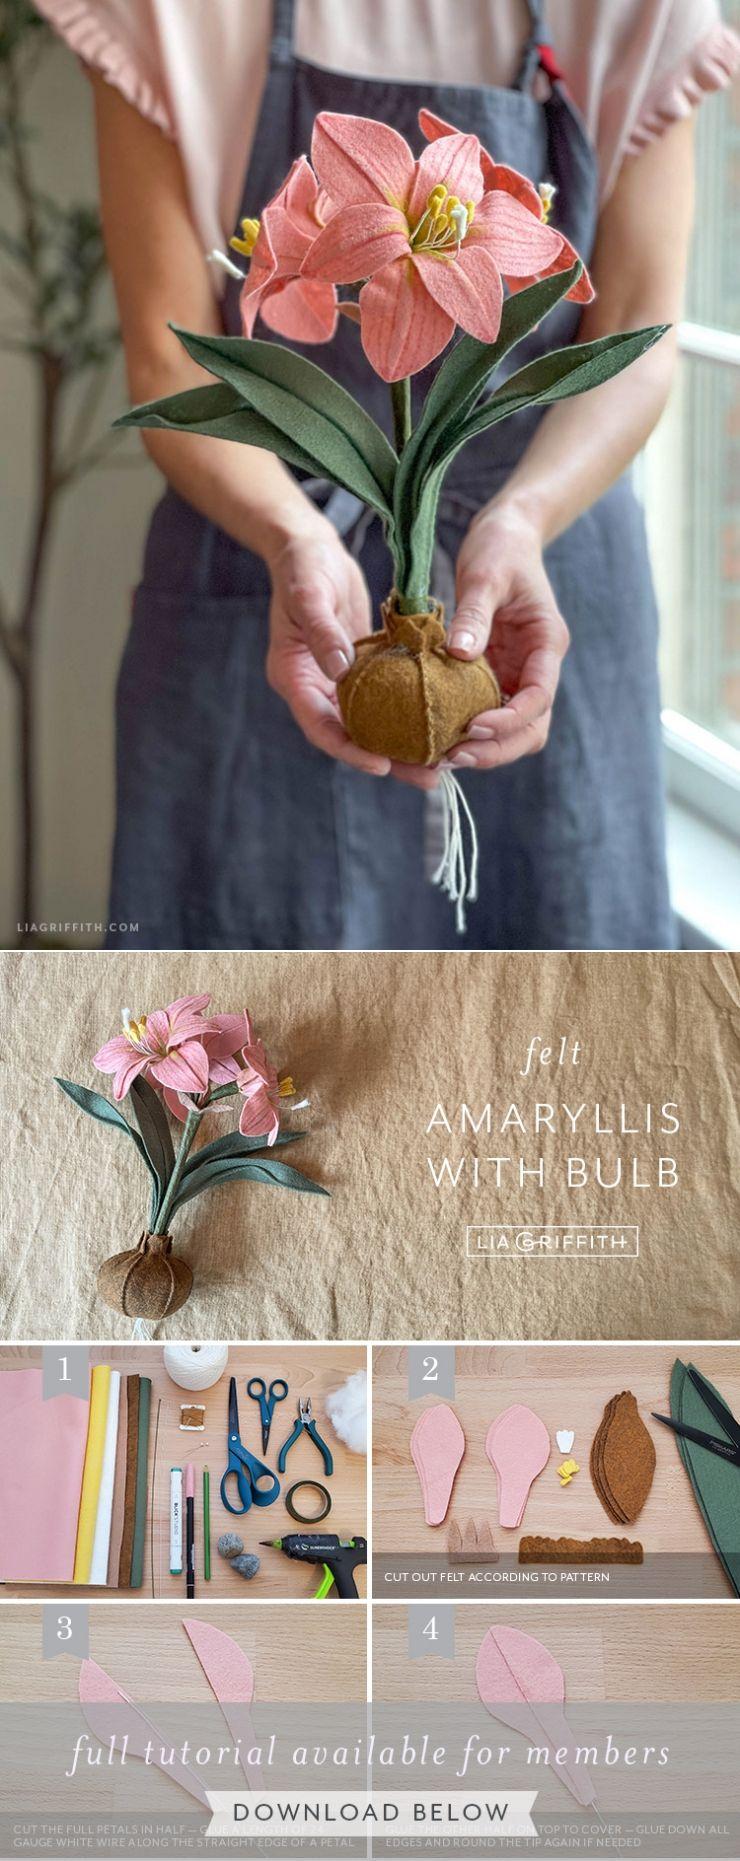 Felt Amaryllis Bulb DIY Template & Tutorial - Lia